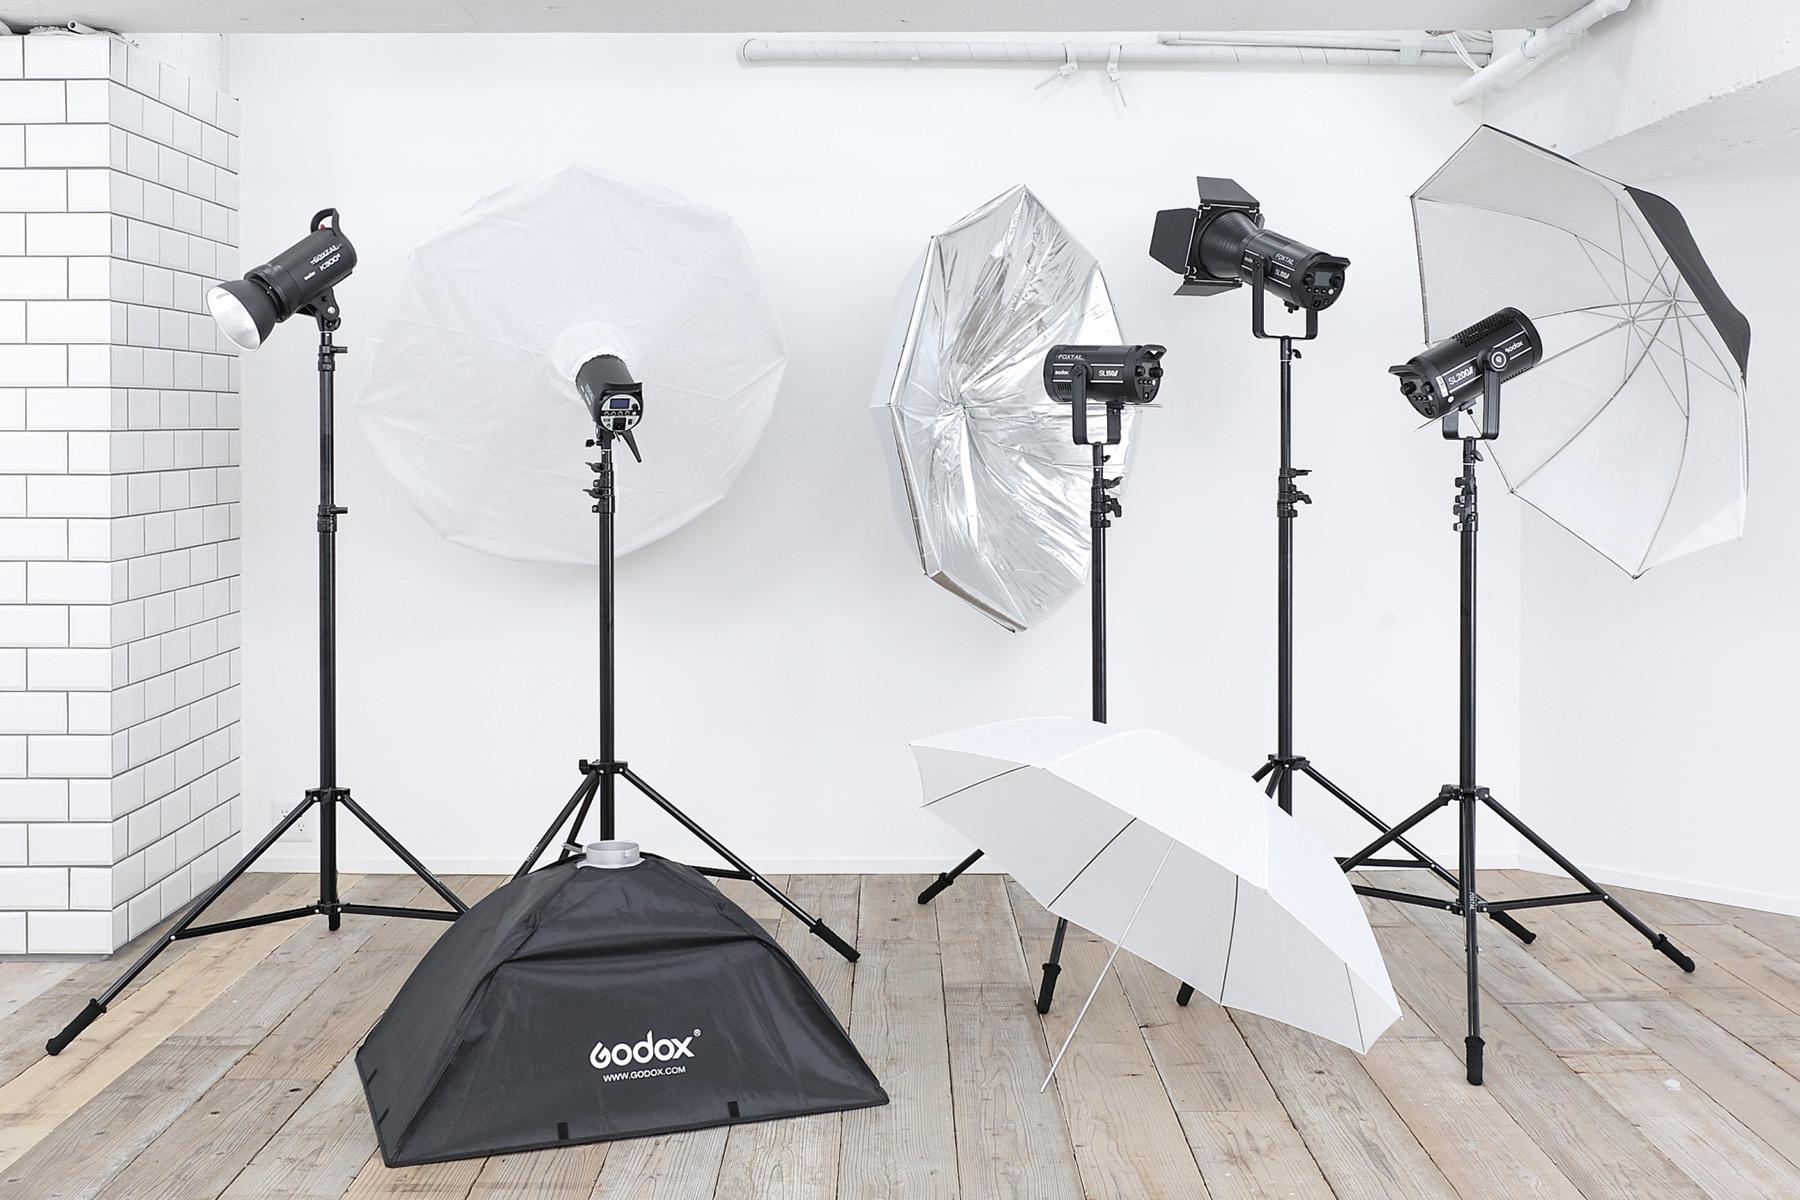 STUDIO FOXTAIL Bst (スタジオ フォックステイル Bst)スタジオ共用機材備品(予約制)